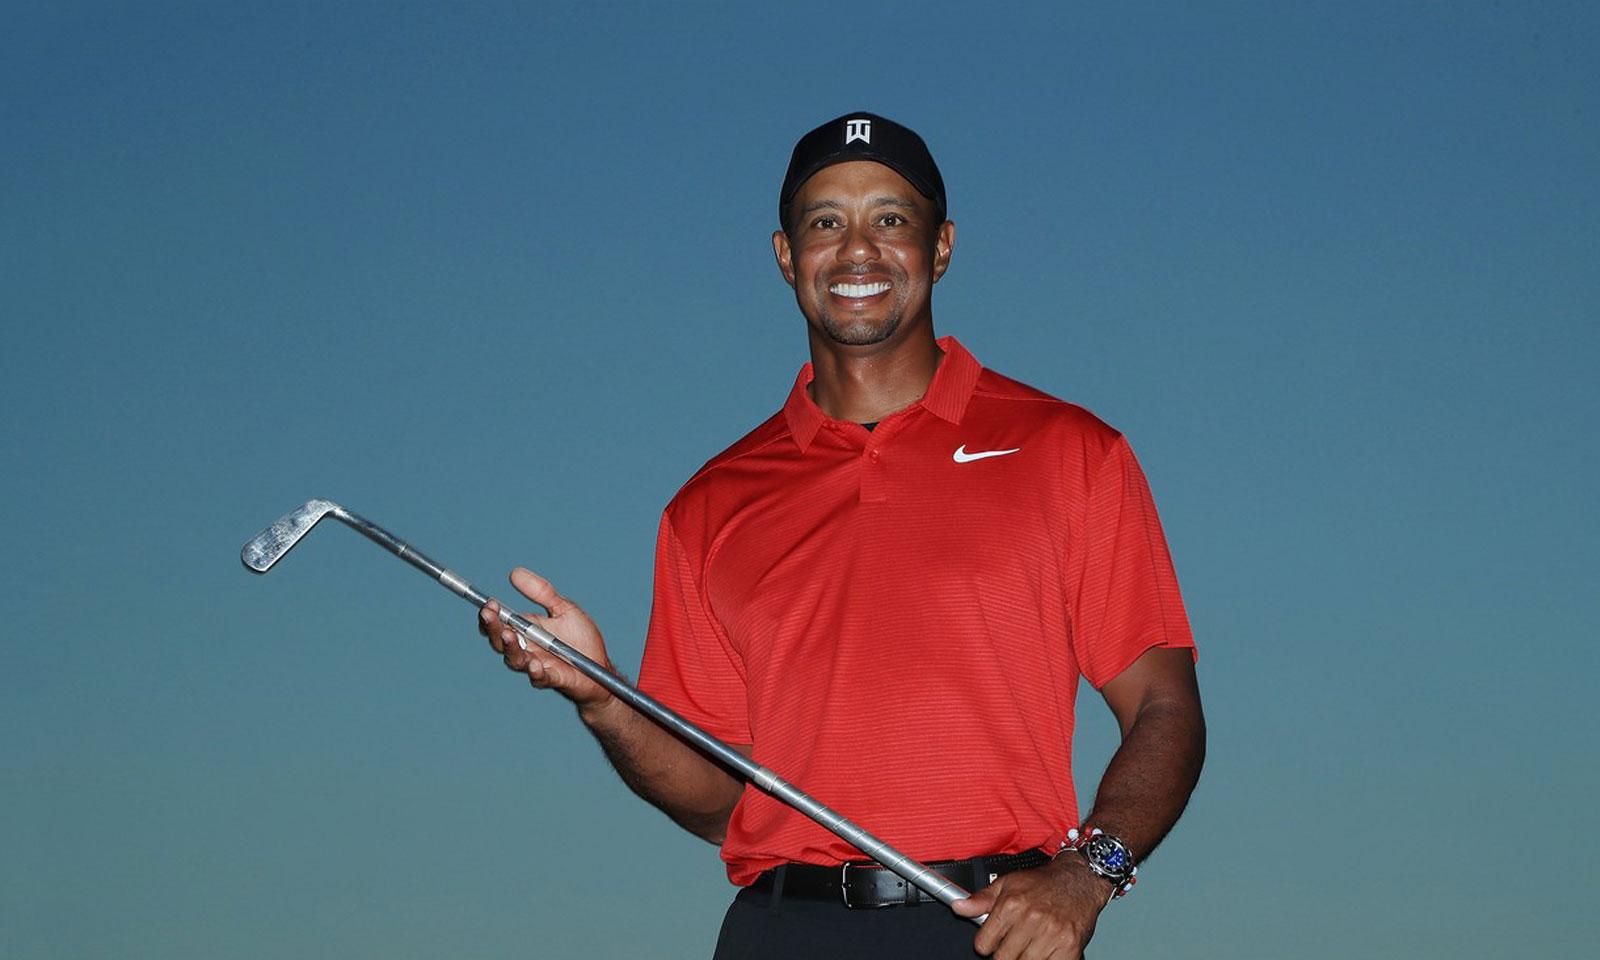 Professional Golf Moneymaker Tiger Woods